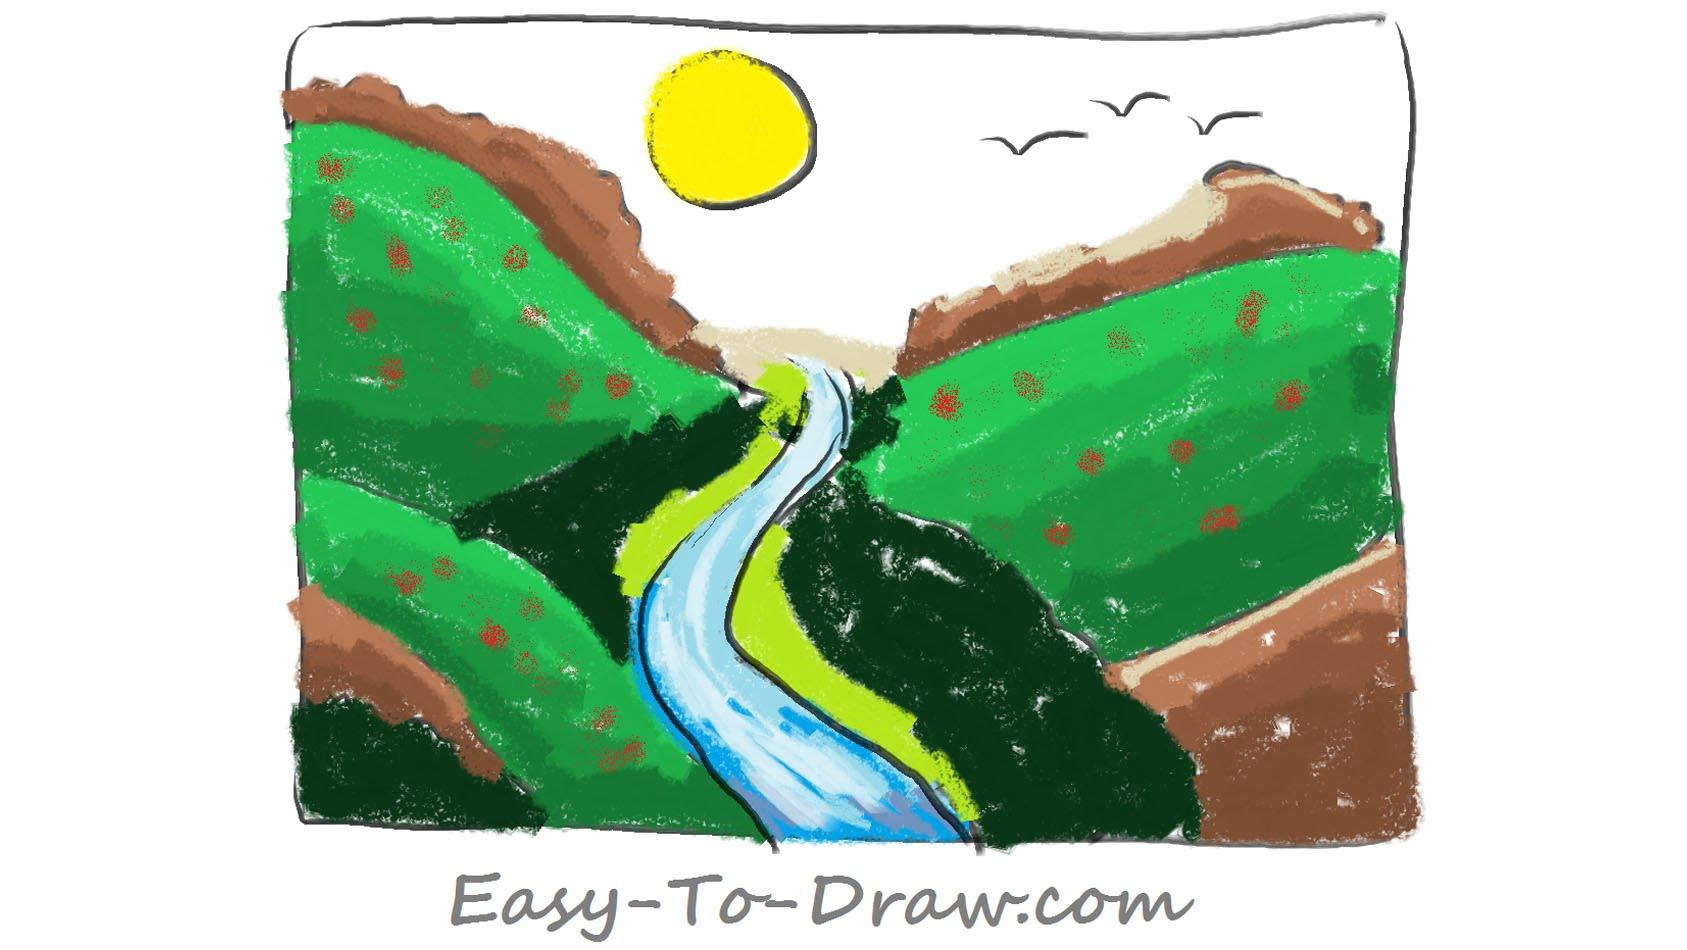 1687x950 How To Draw A Plentiful Cartoon River Valley